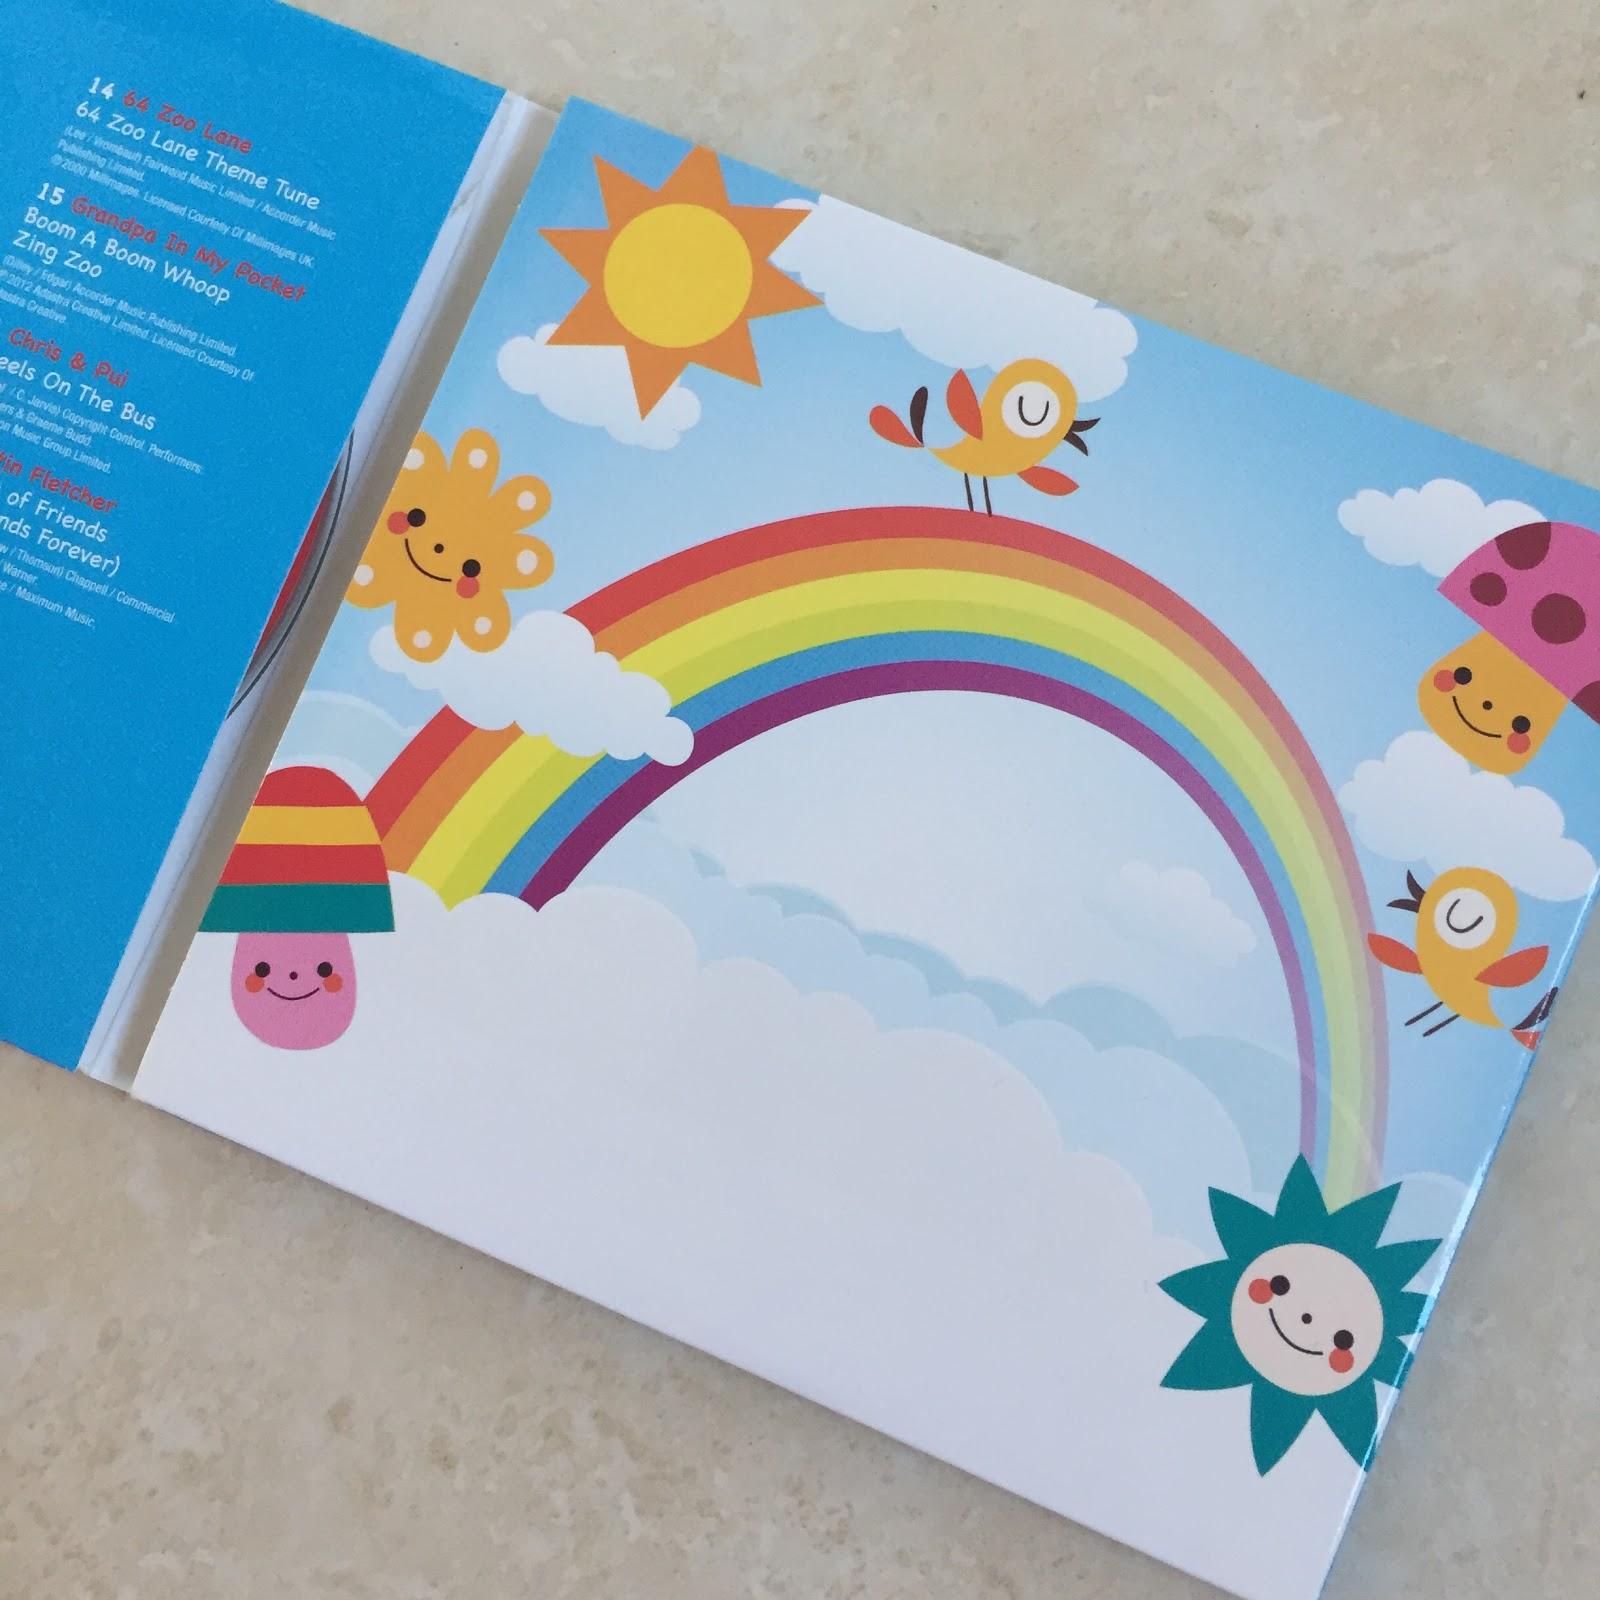 Mrs Bishop's Bakes and Banter: Kids Songs CD, Rastamouse App